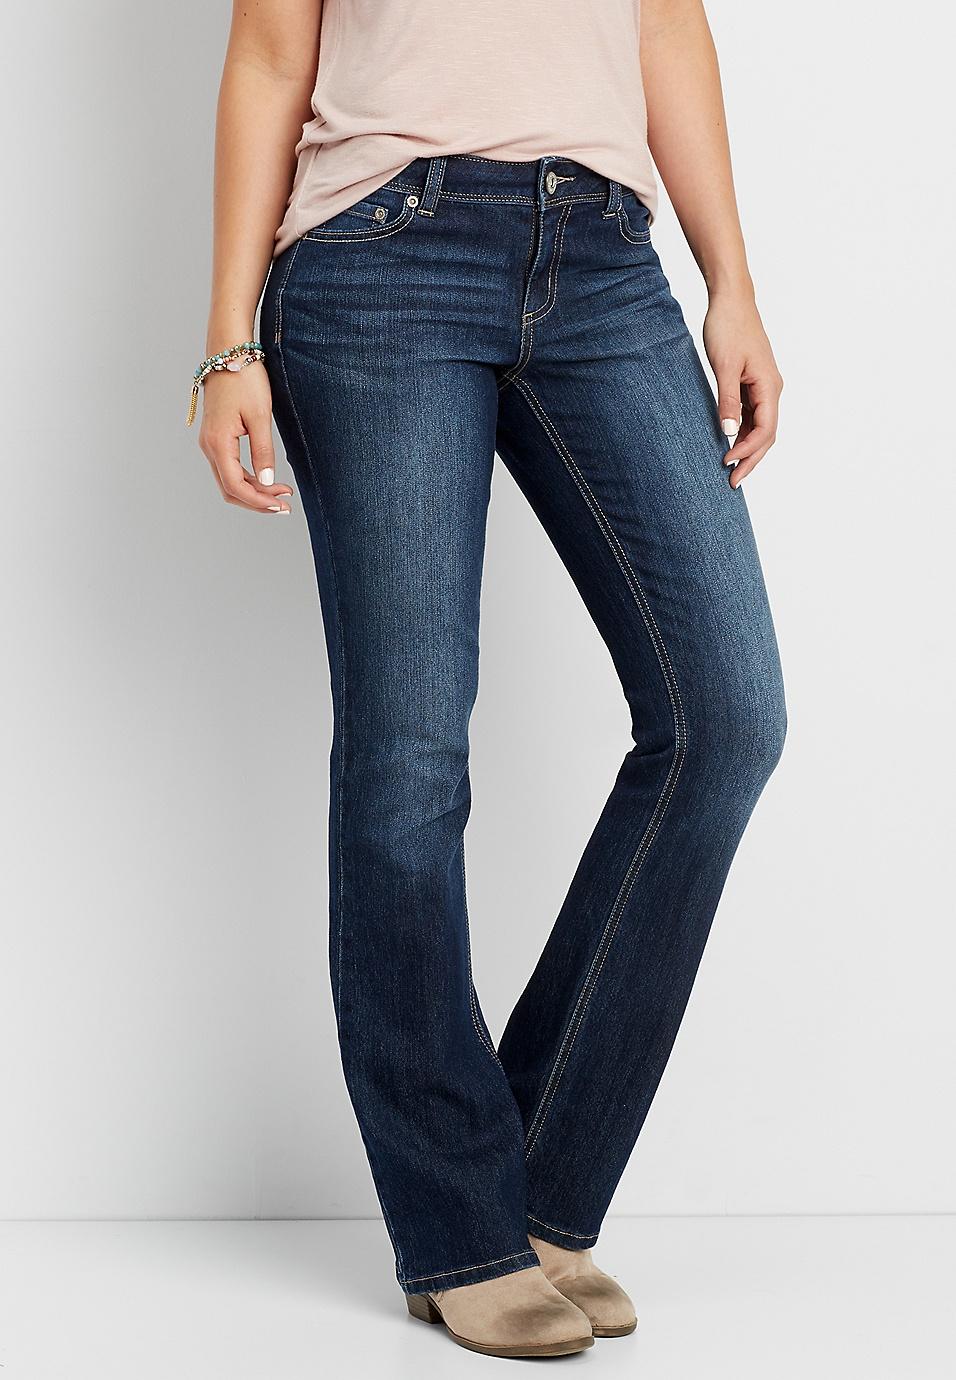 c3e46e5adb8ed DenimFlex™ dark wash bootcut jeans